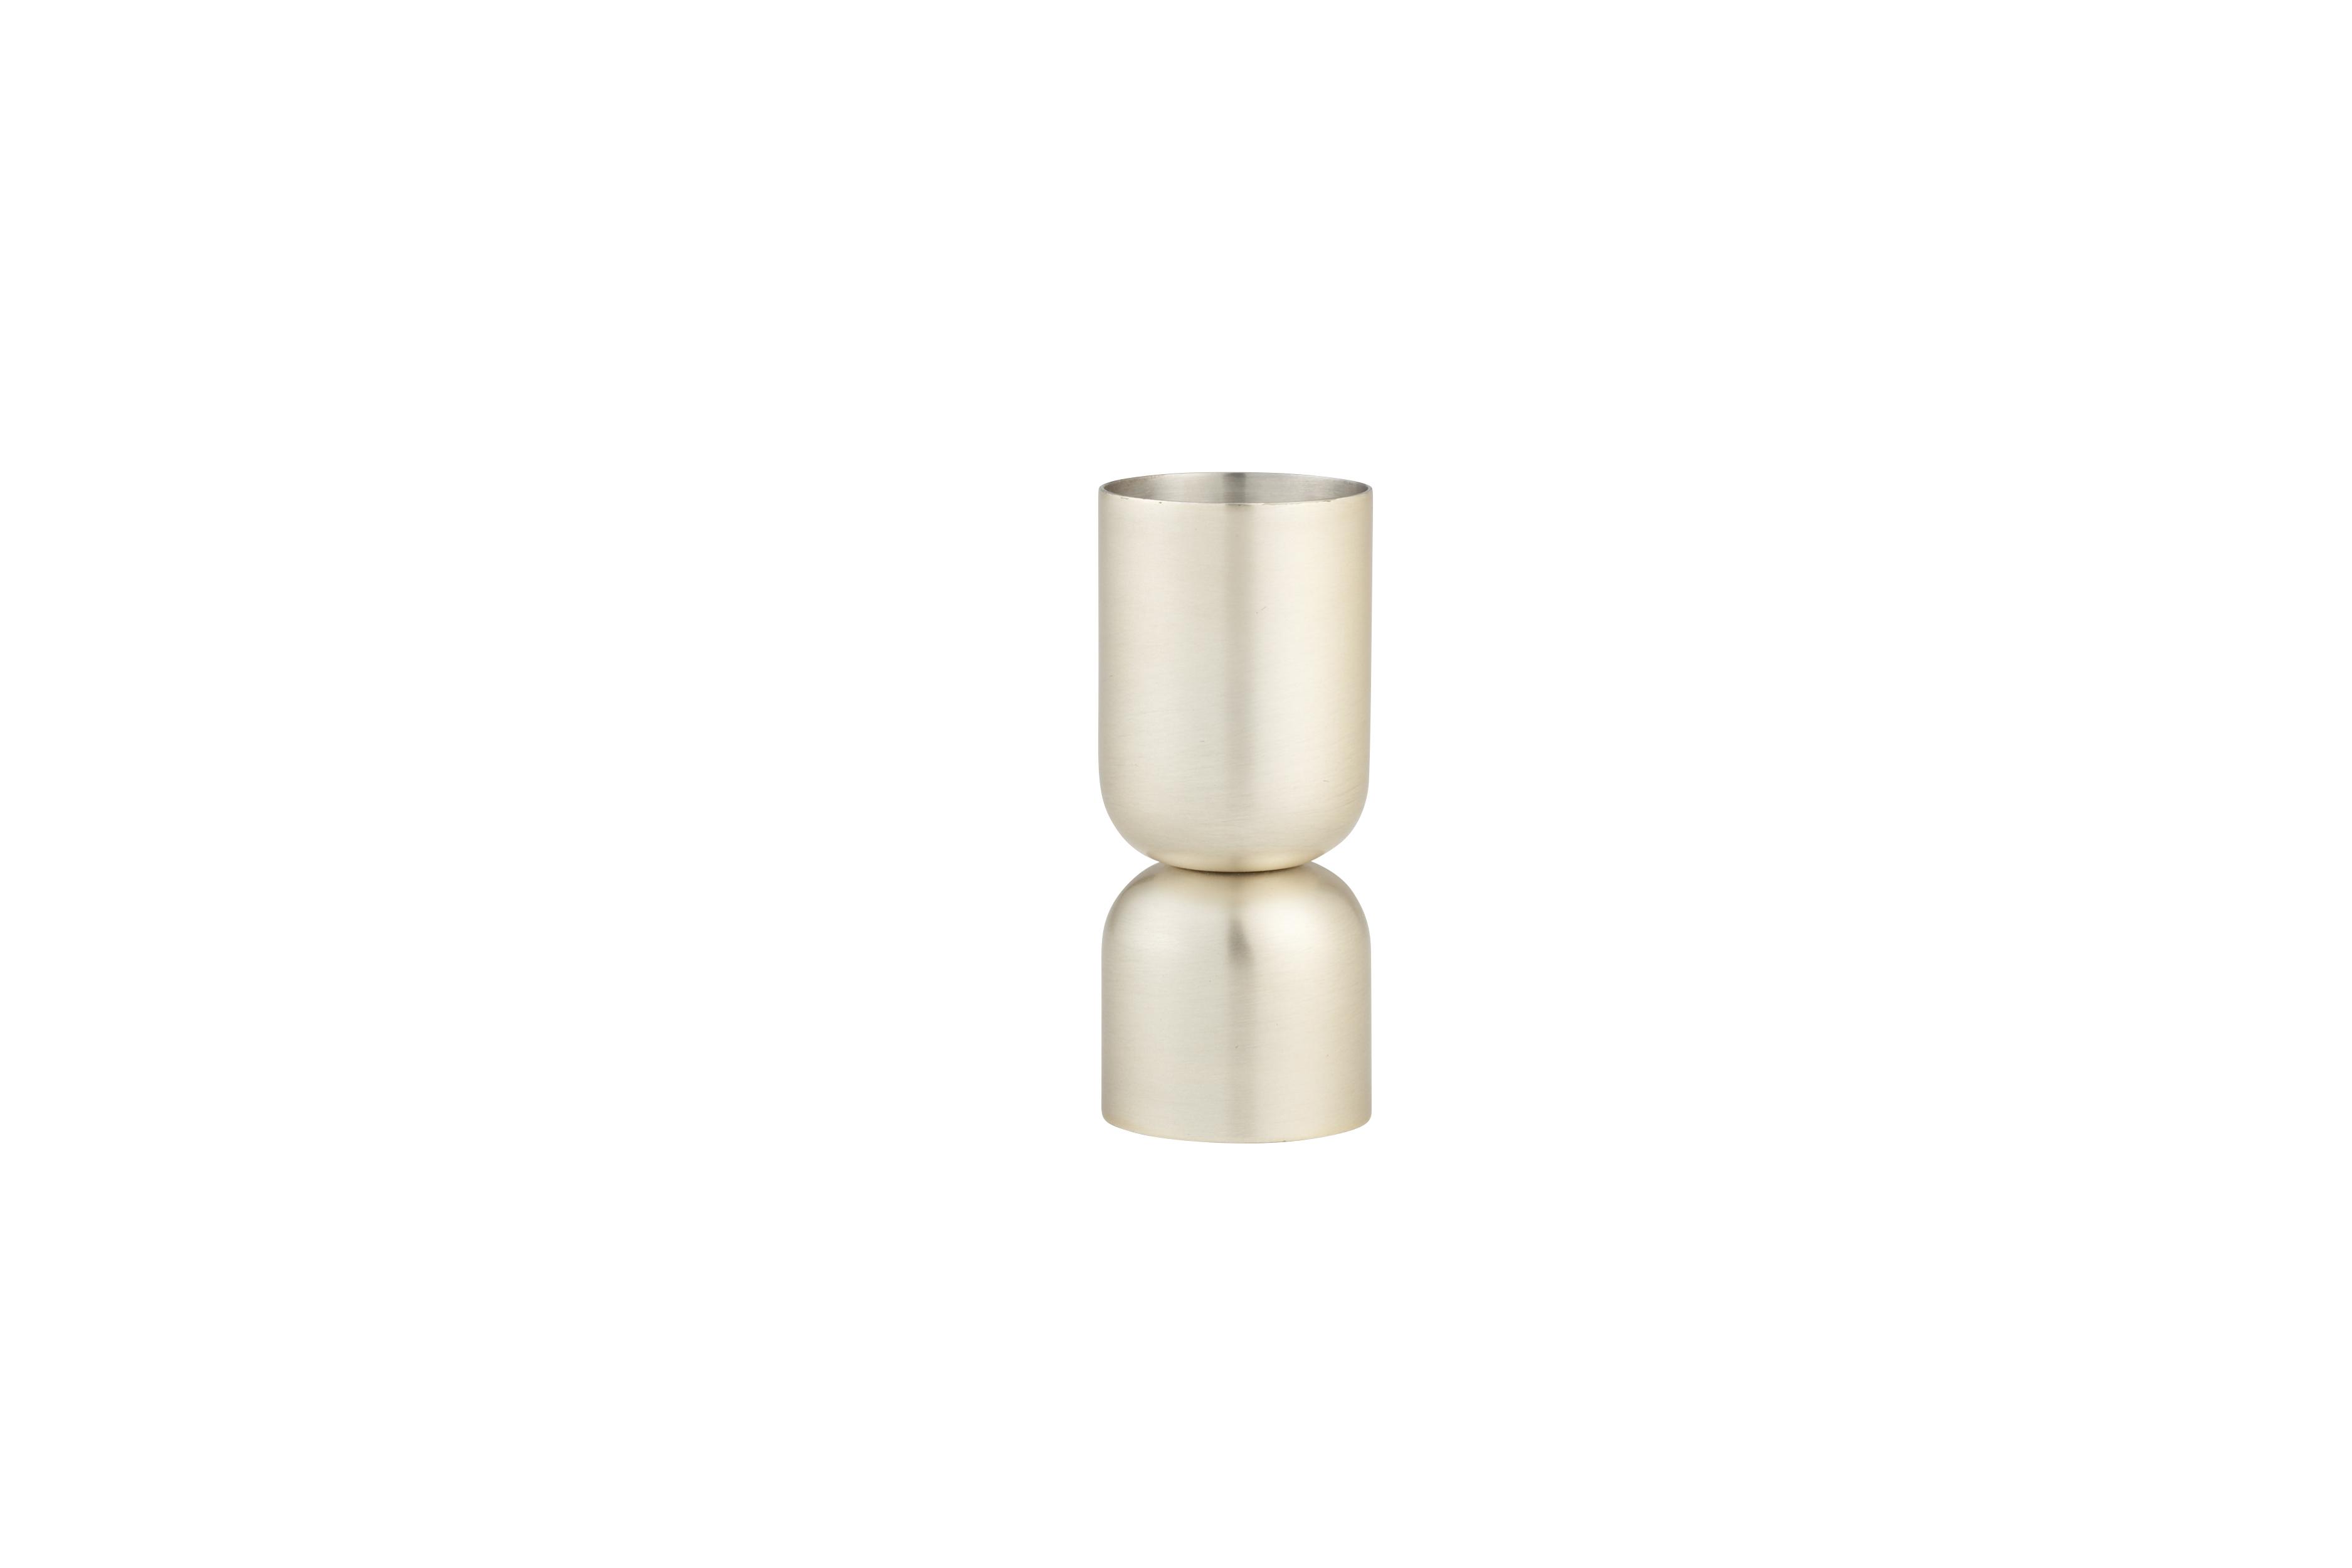 Orb Champagne Gold Jigger - $10